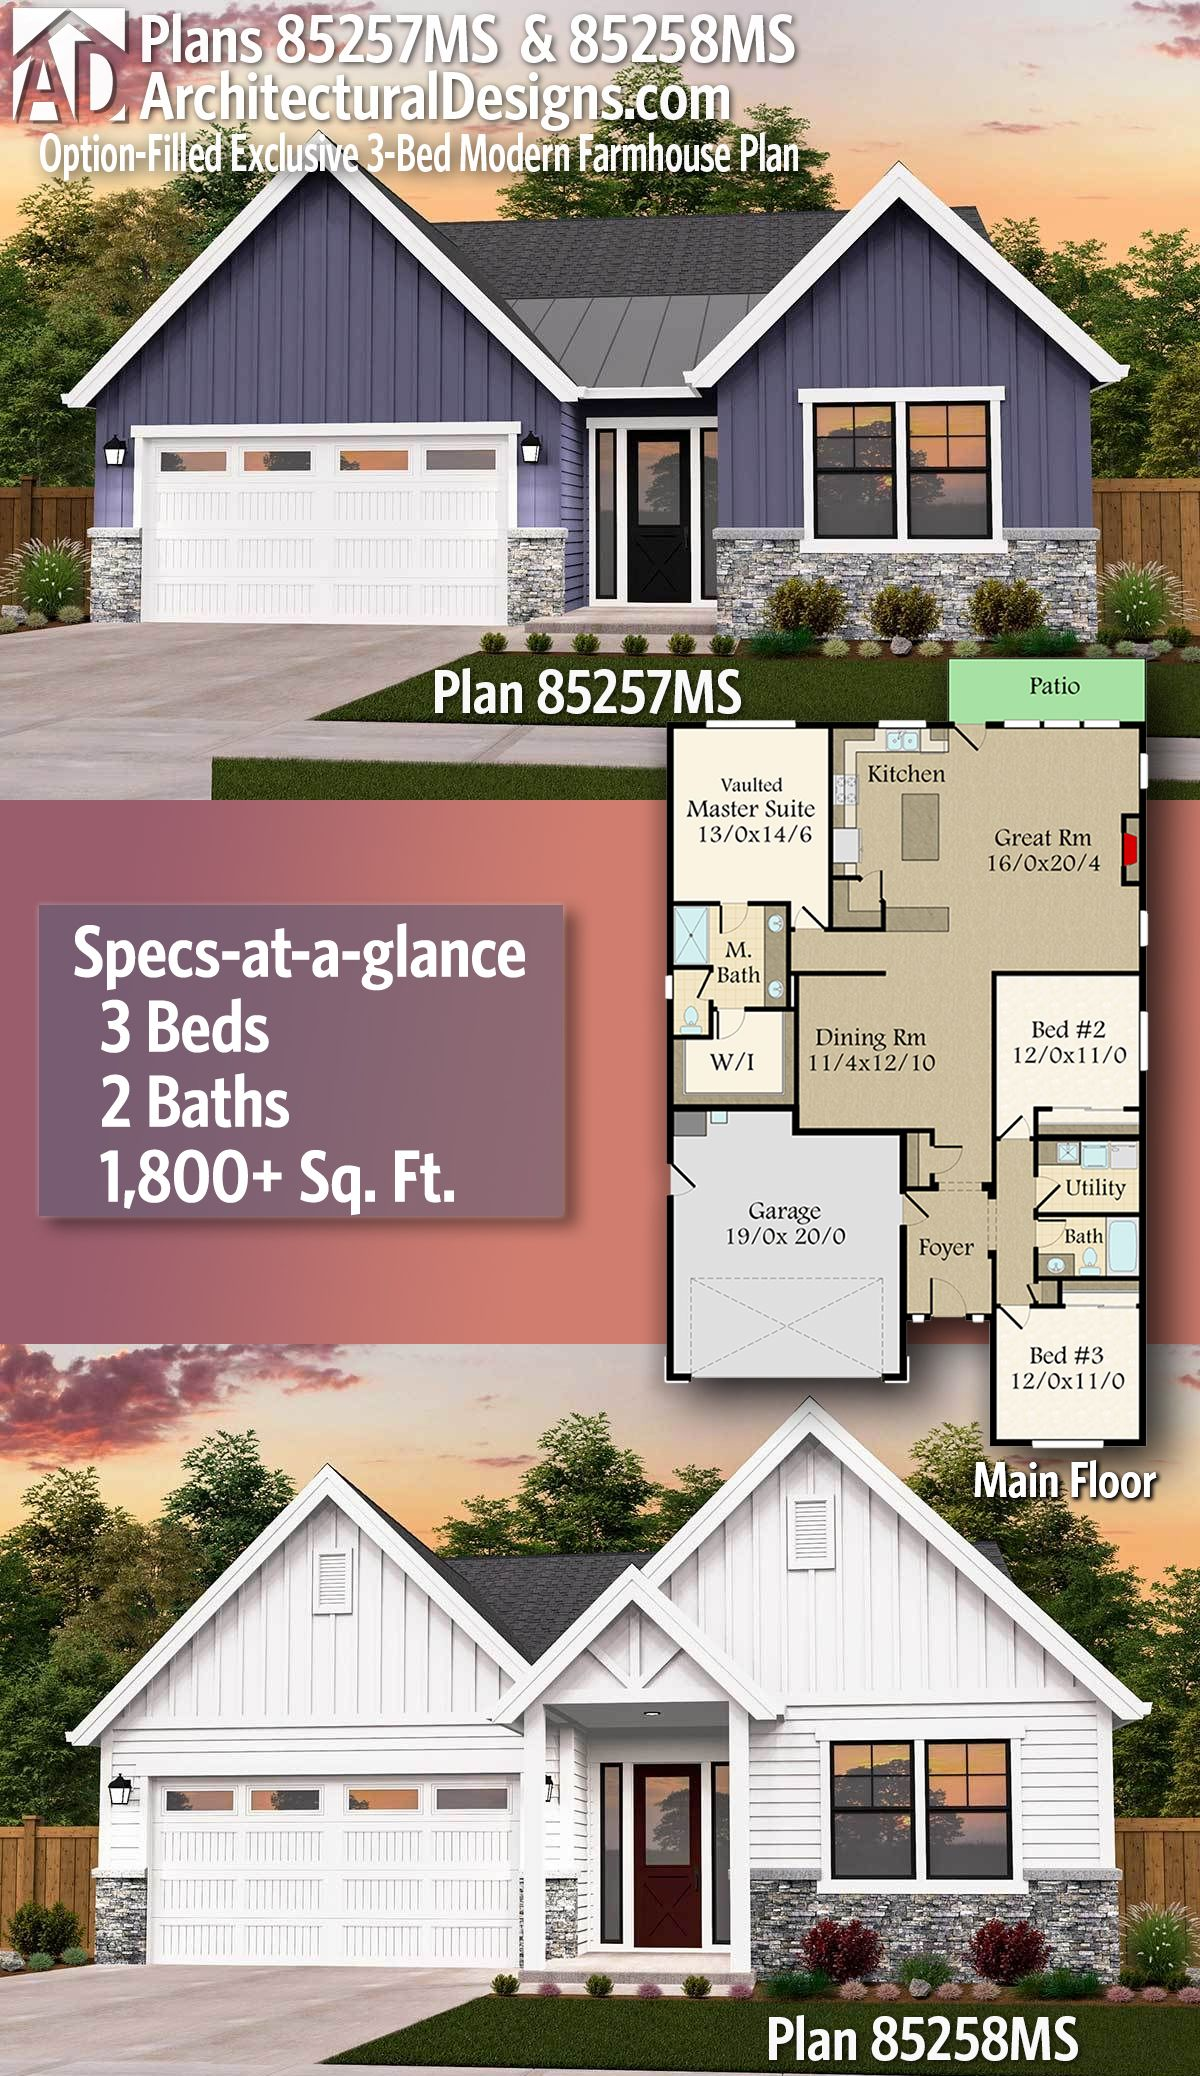 18++ Affordable modern farmhouse plans info